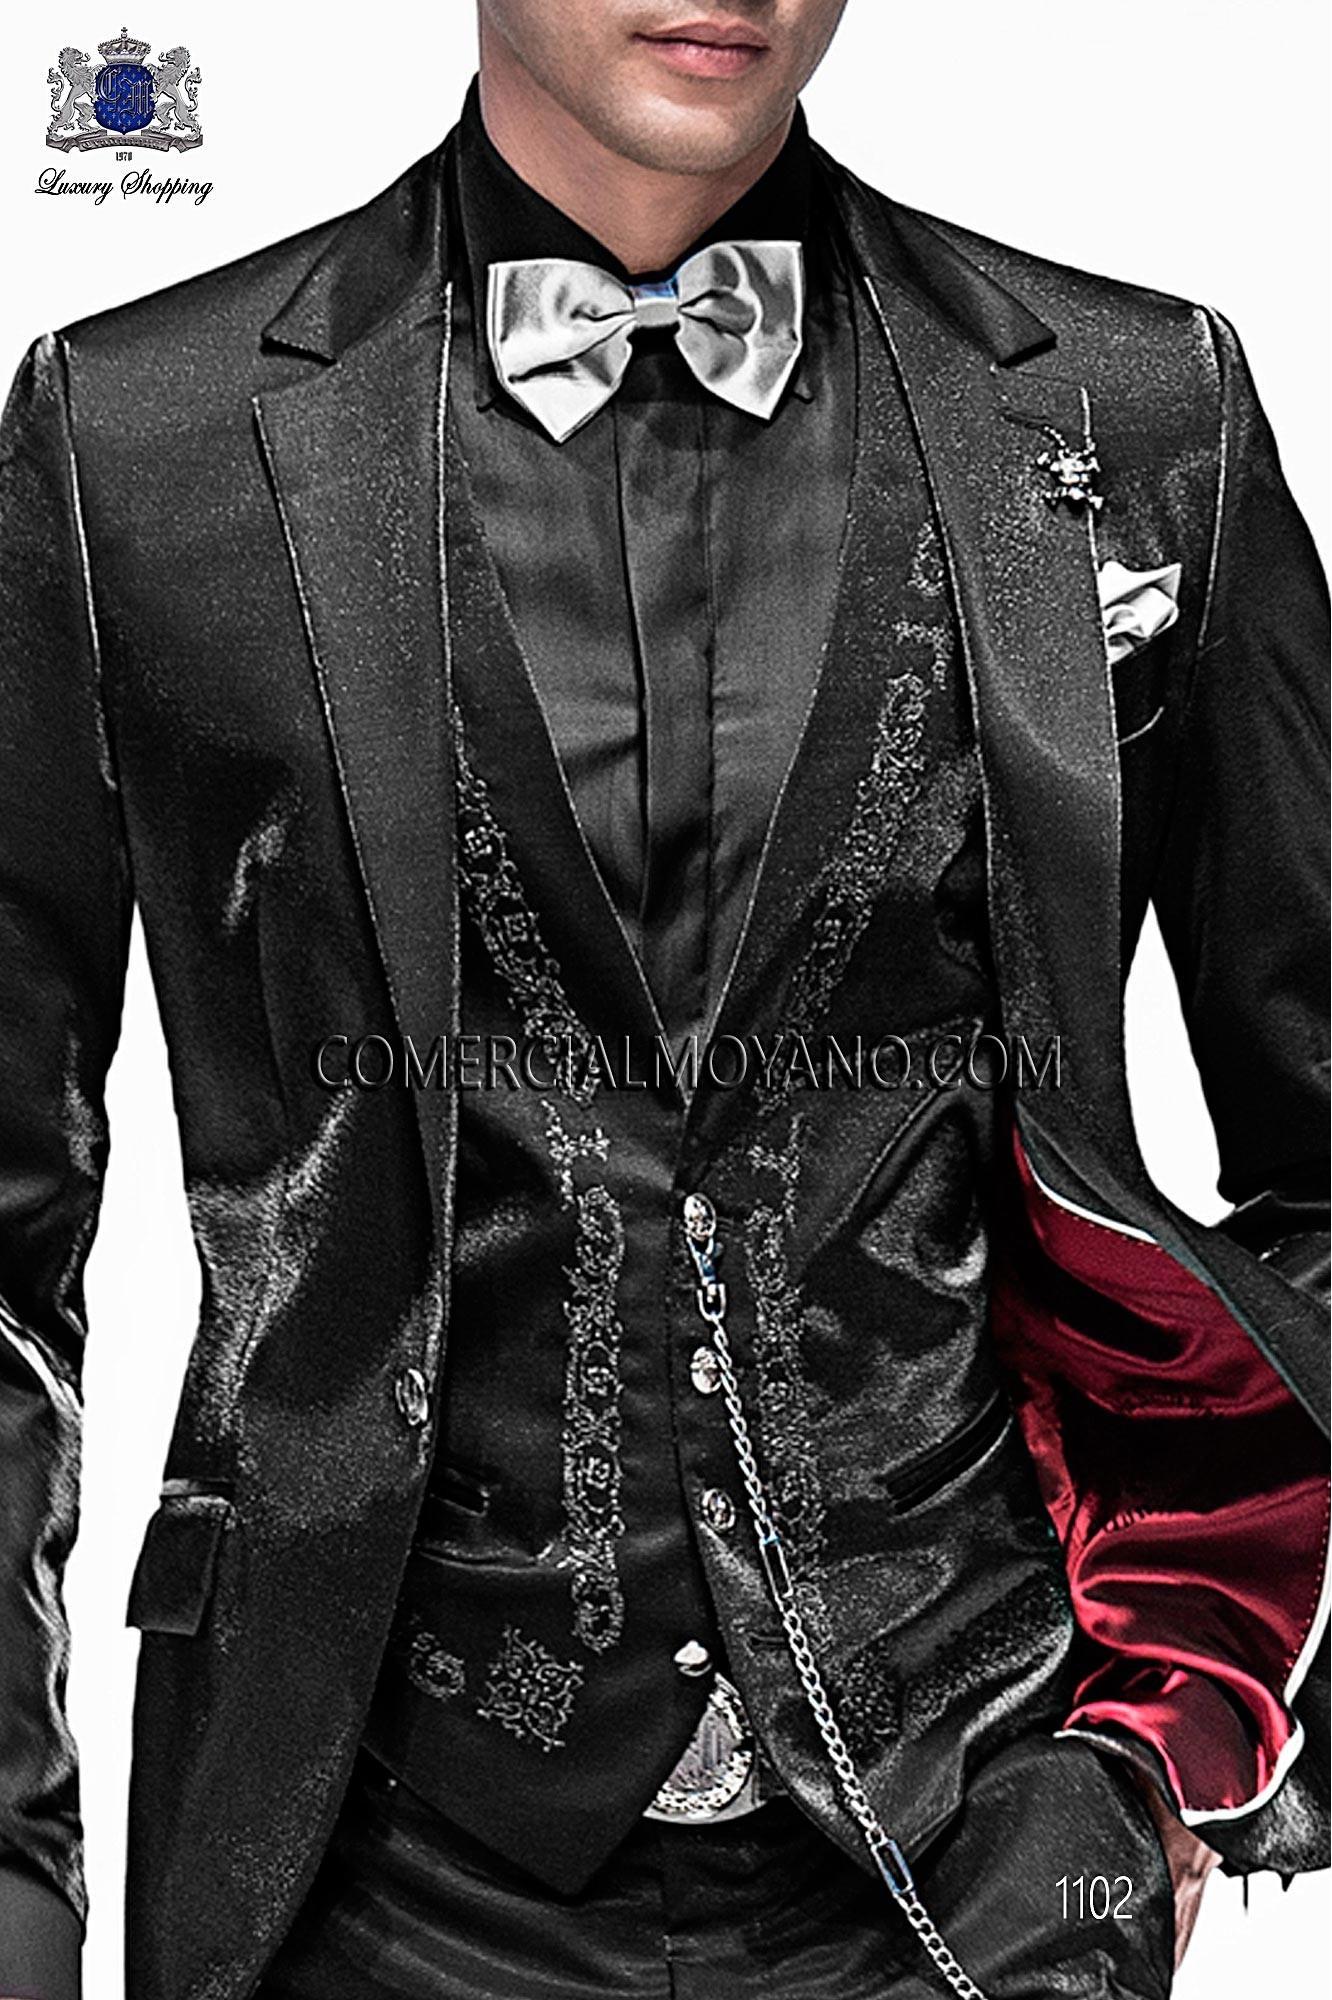 Italian emotion black and gold men wedding suit, model: 1102 Ottavio Nuccio Gala 2017 Emotion Collection